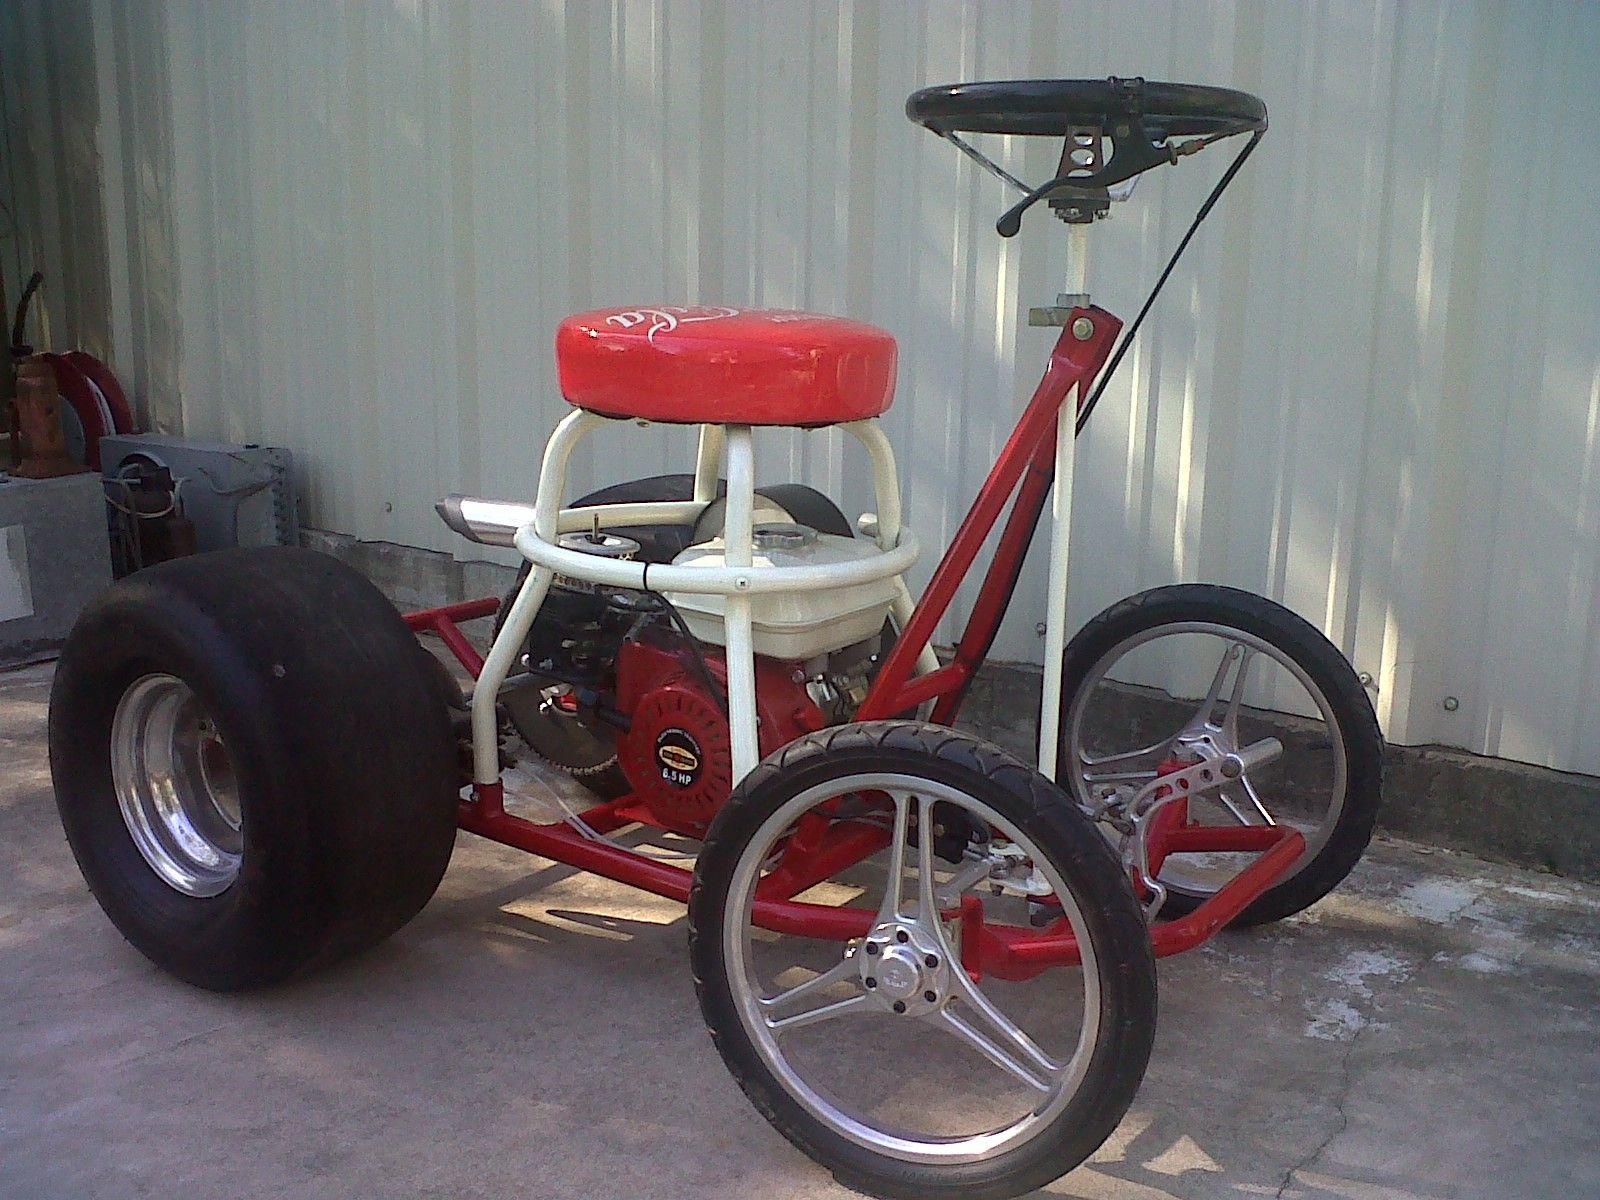 Lovely Bar Stool Go Kart for Sale Graphics eccleshallfccom : 07217786aa5809a3567f2af4726f41b8 from eccleshallfc.com size 1600 x 1200 jpeg 421kB